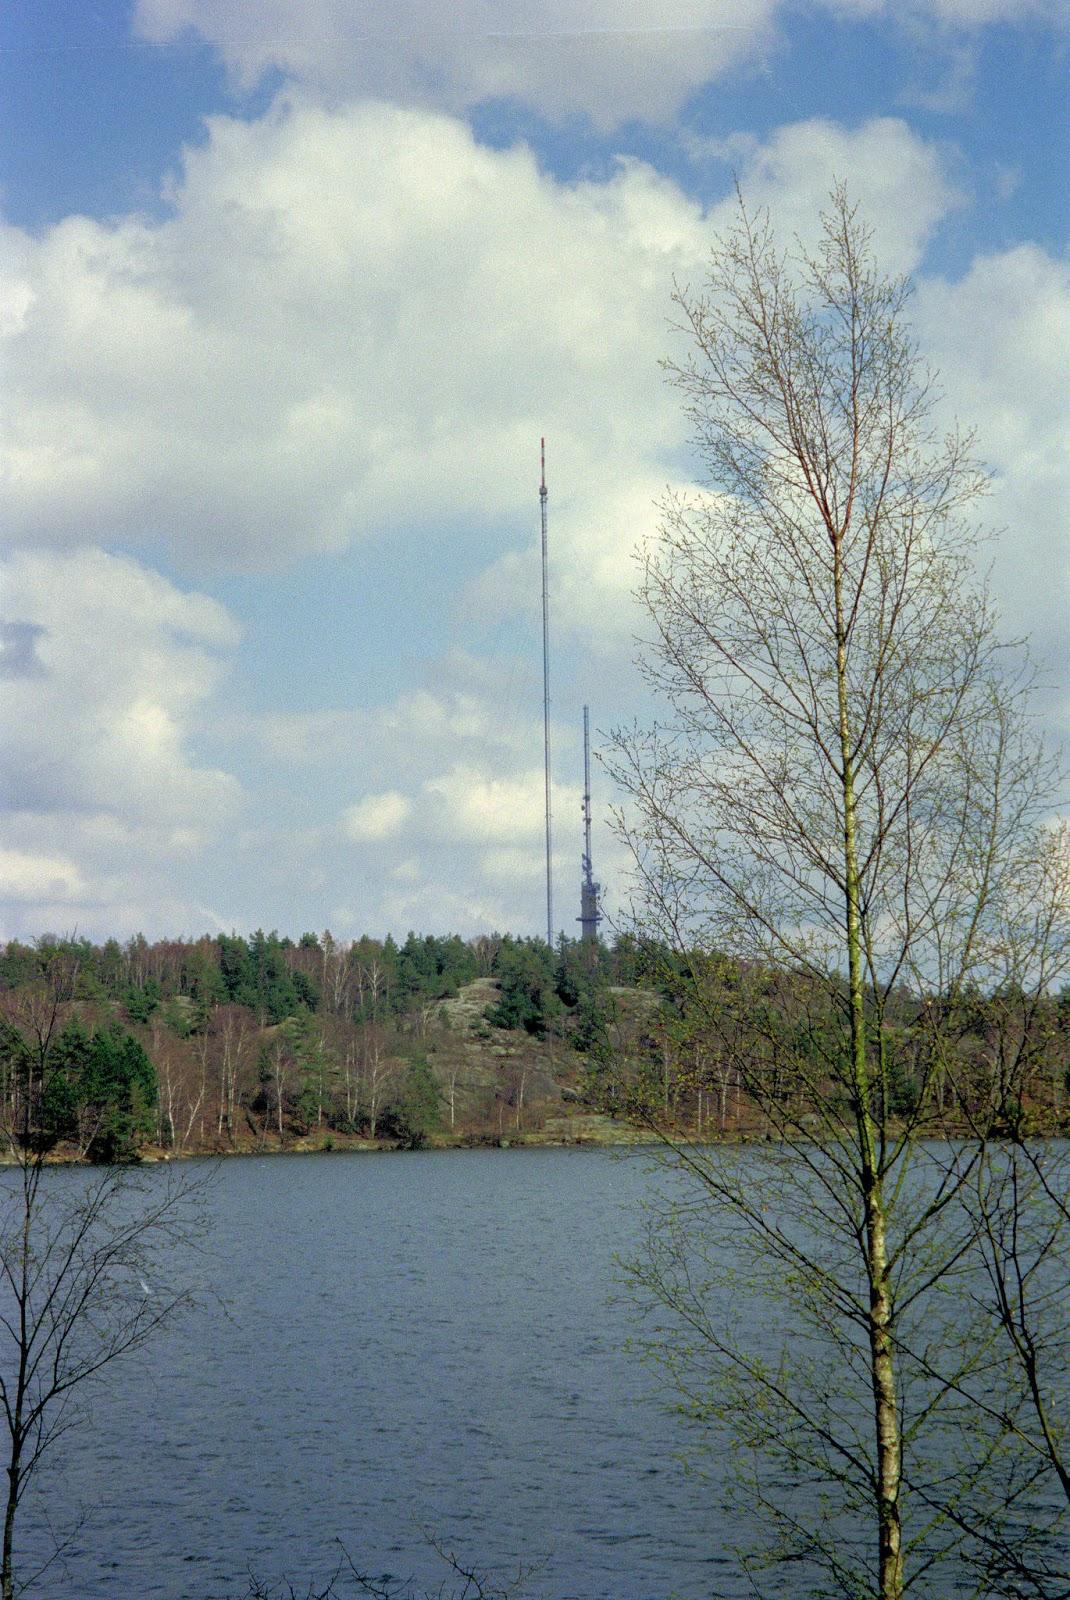 Gothenburg Reservoir